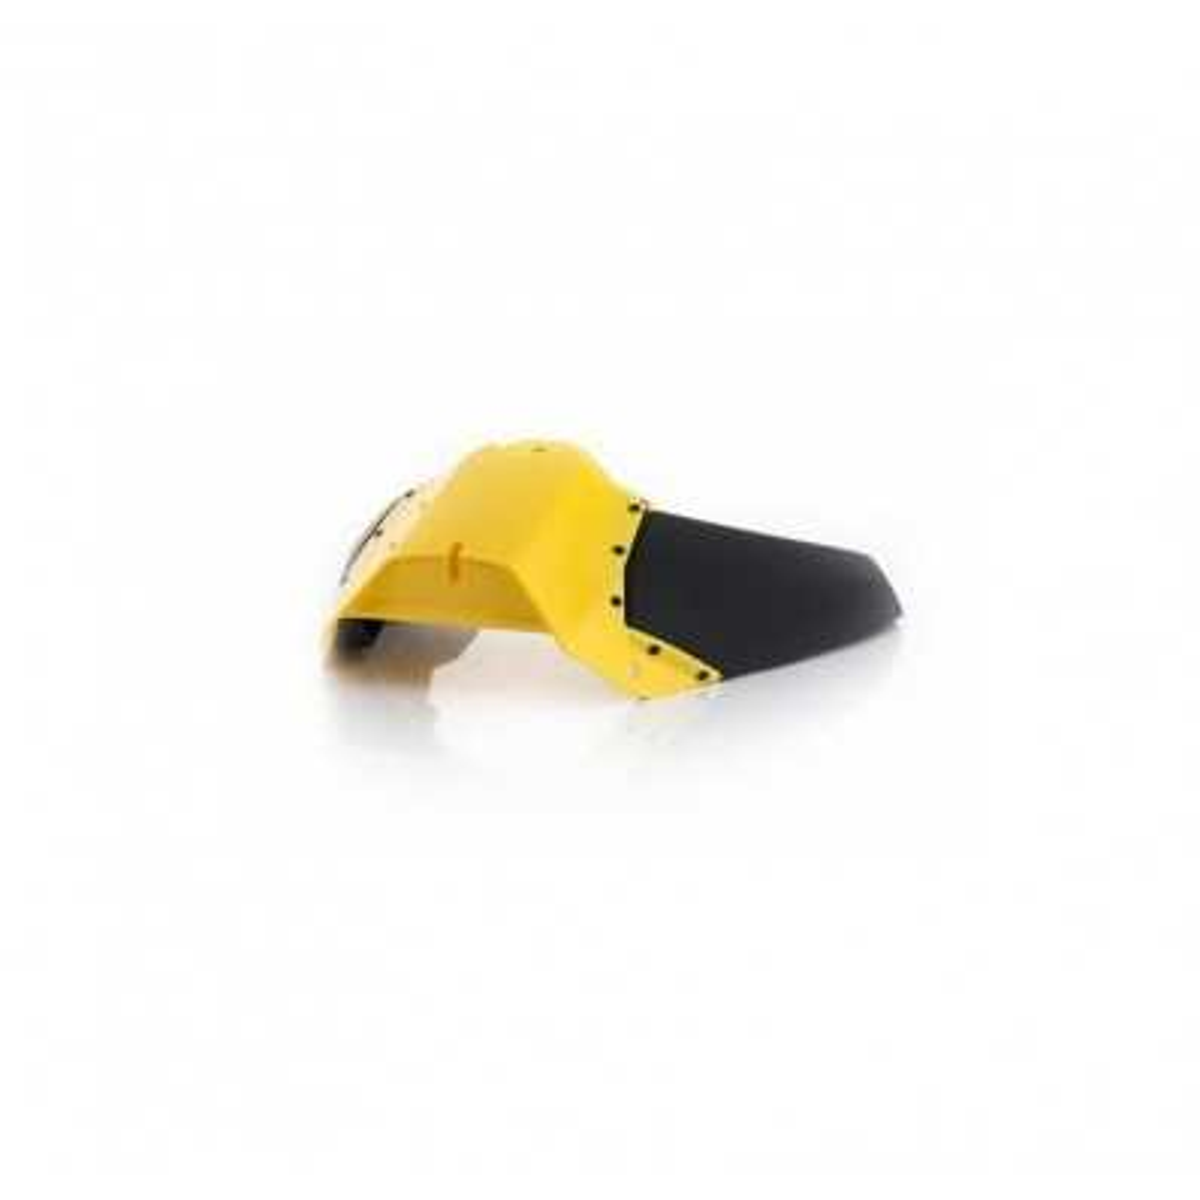 0017559-060 - Cubierta Radiador Superior Yzf250 14 18 Amarillo